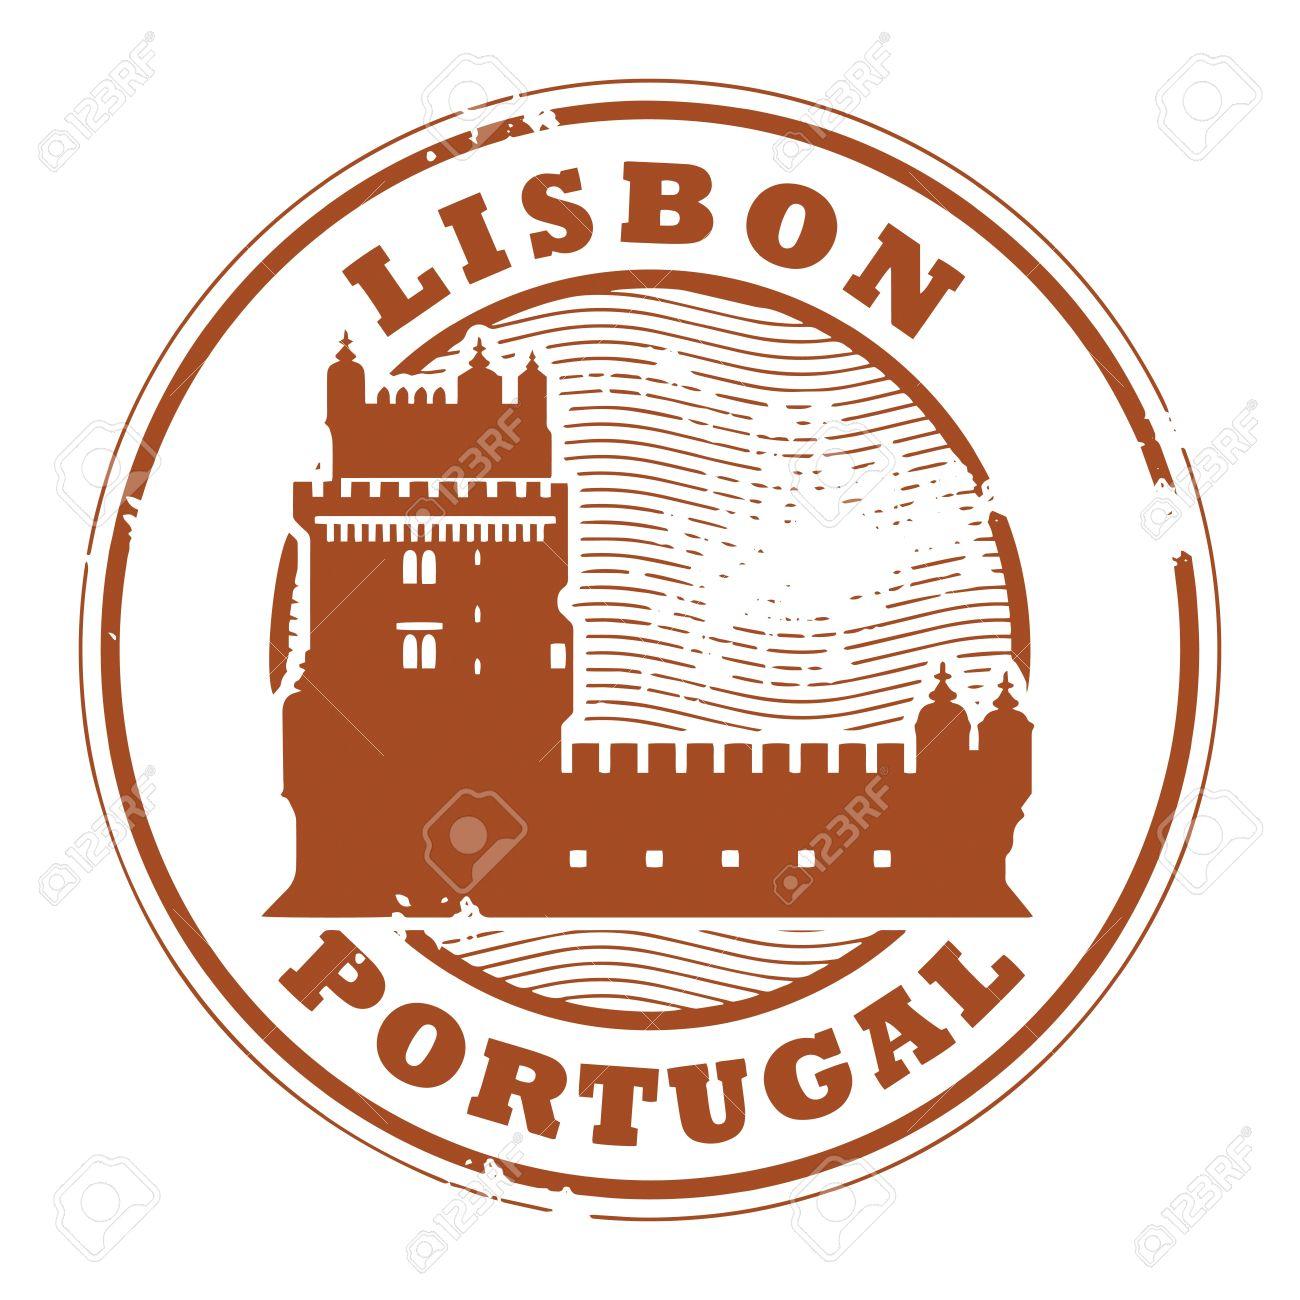 Red Onion Illustration Lisbon clipart - Clipg...